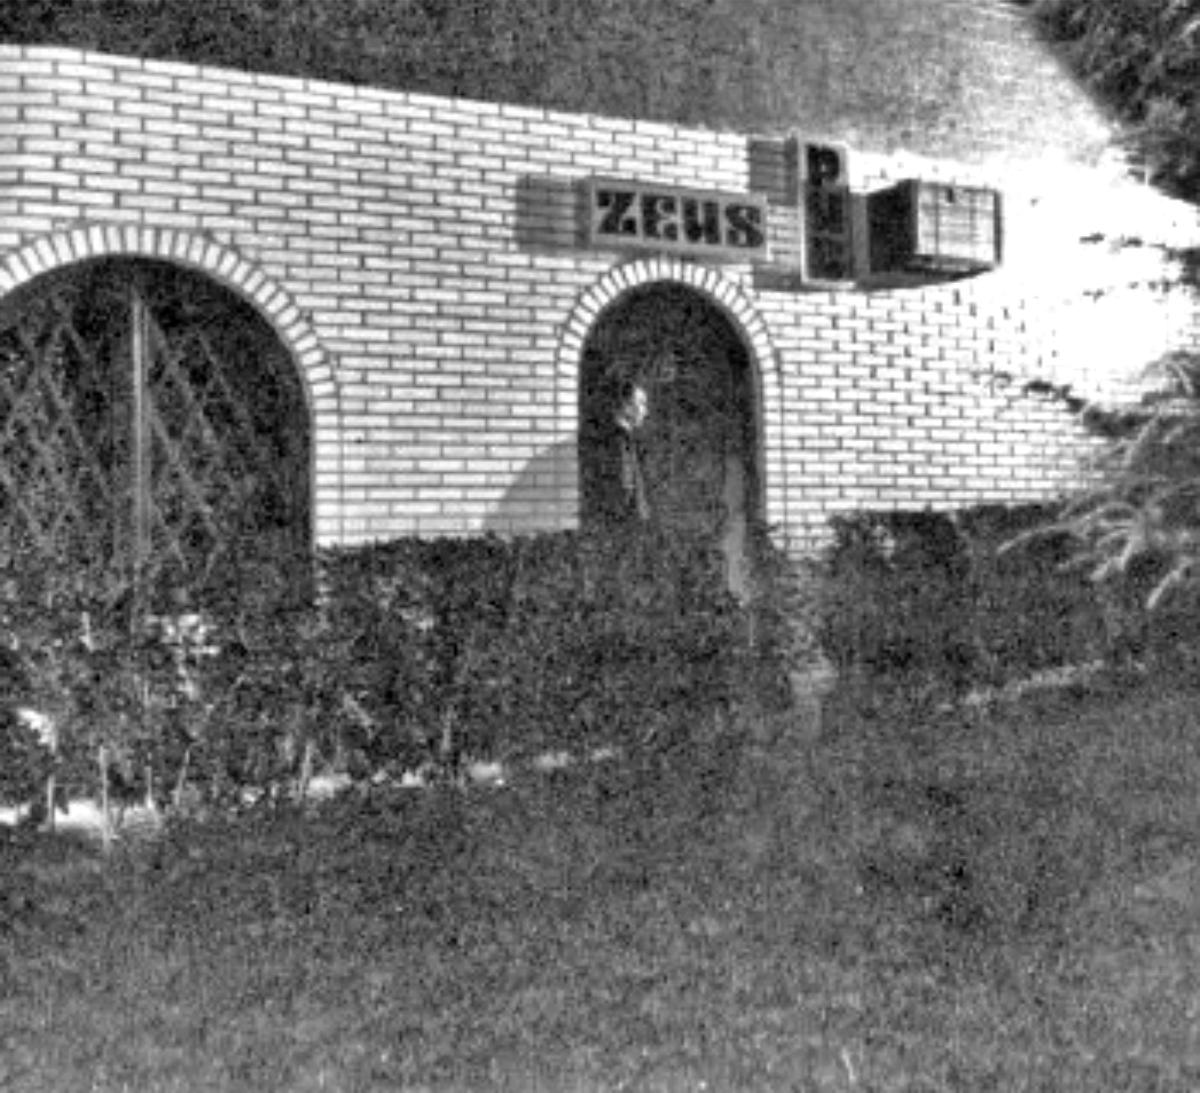 ¡Buenos días#Alcorcón! Así era el Pub Zeus en la calle Cantarranas en 1978. Pongamos que hablo de Alcorcón. Soy de https://t.co/O5CuDMRoZi #AlcorcónAntiguo #MeGustaAlcorcón #foto #fotografía #photo #alcorconhoy https://t.co/LdhIKgJEkn